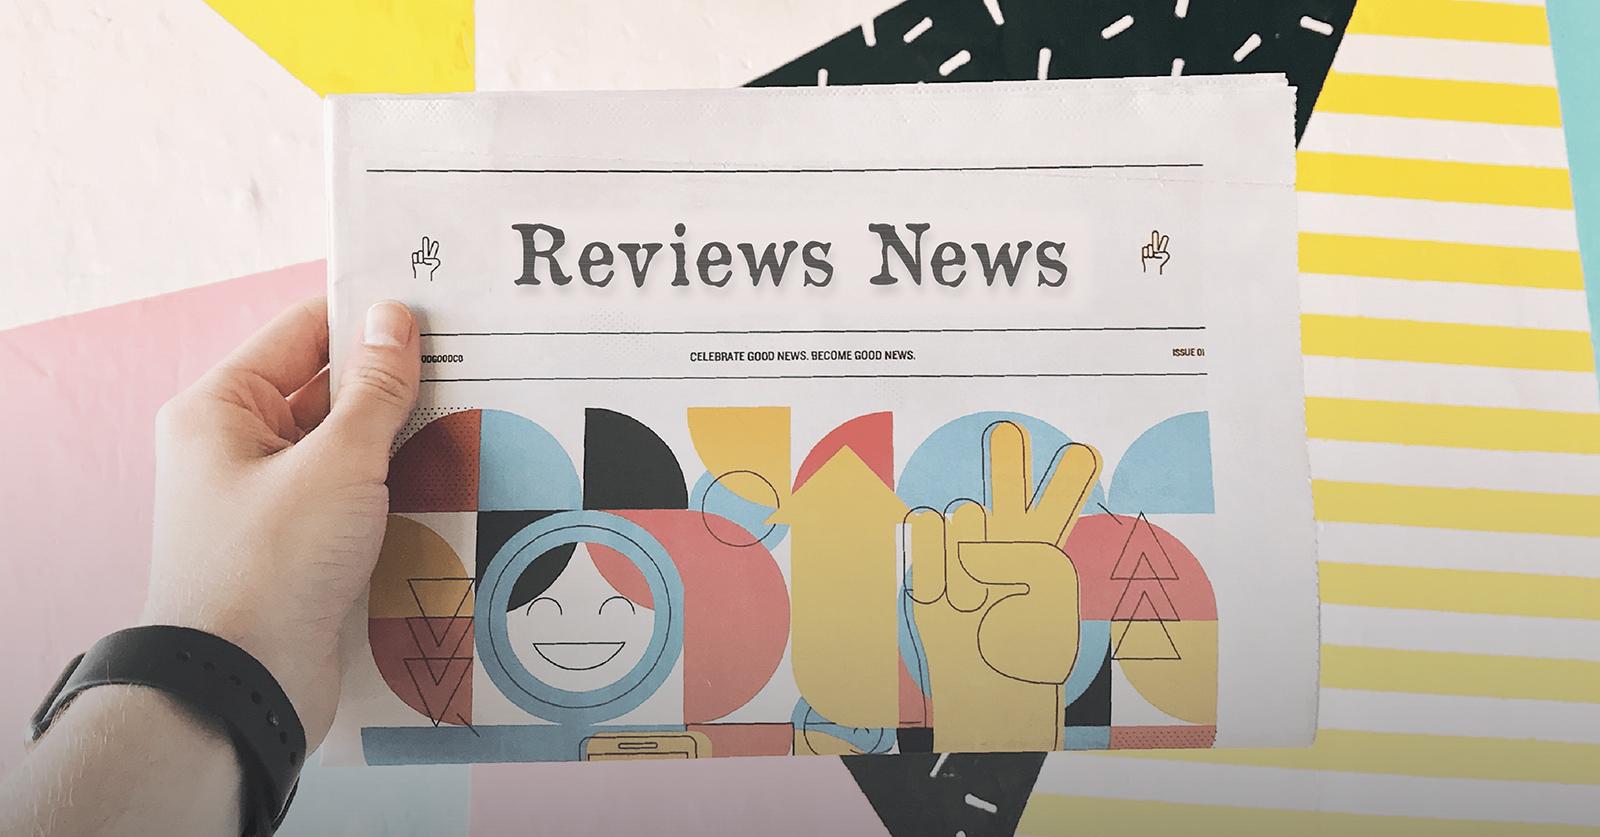 Reviews News: June '19